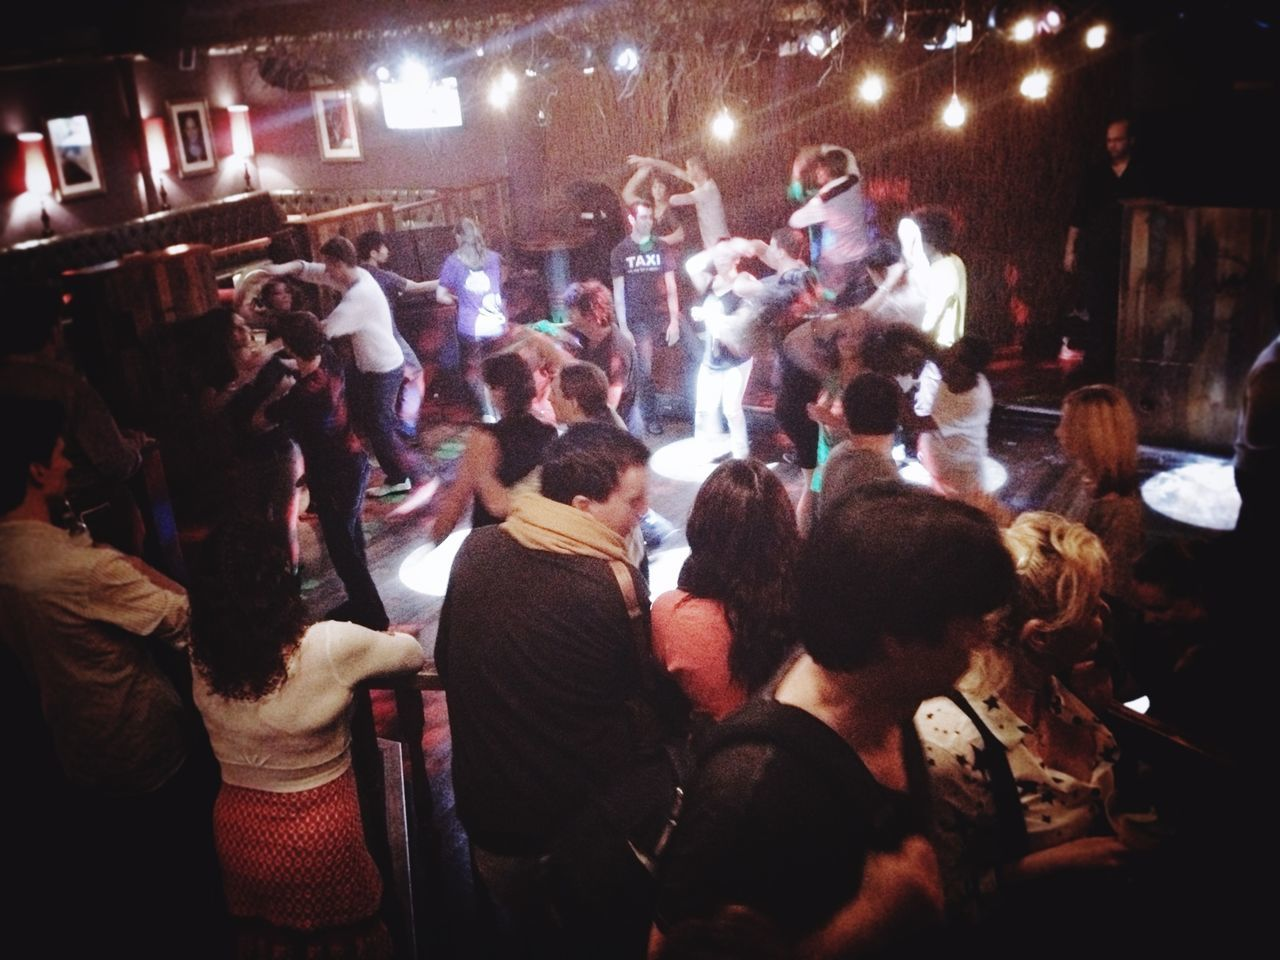 large group of people, nightlife, night, illuminated, crowd, real people, men, audience, enjoyment, fun, performance, women, music, nightclub, indoors, people, adult